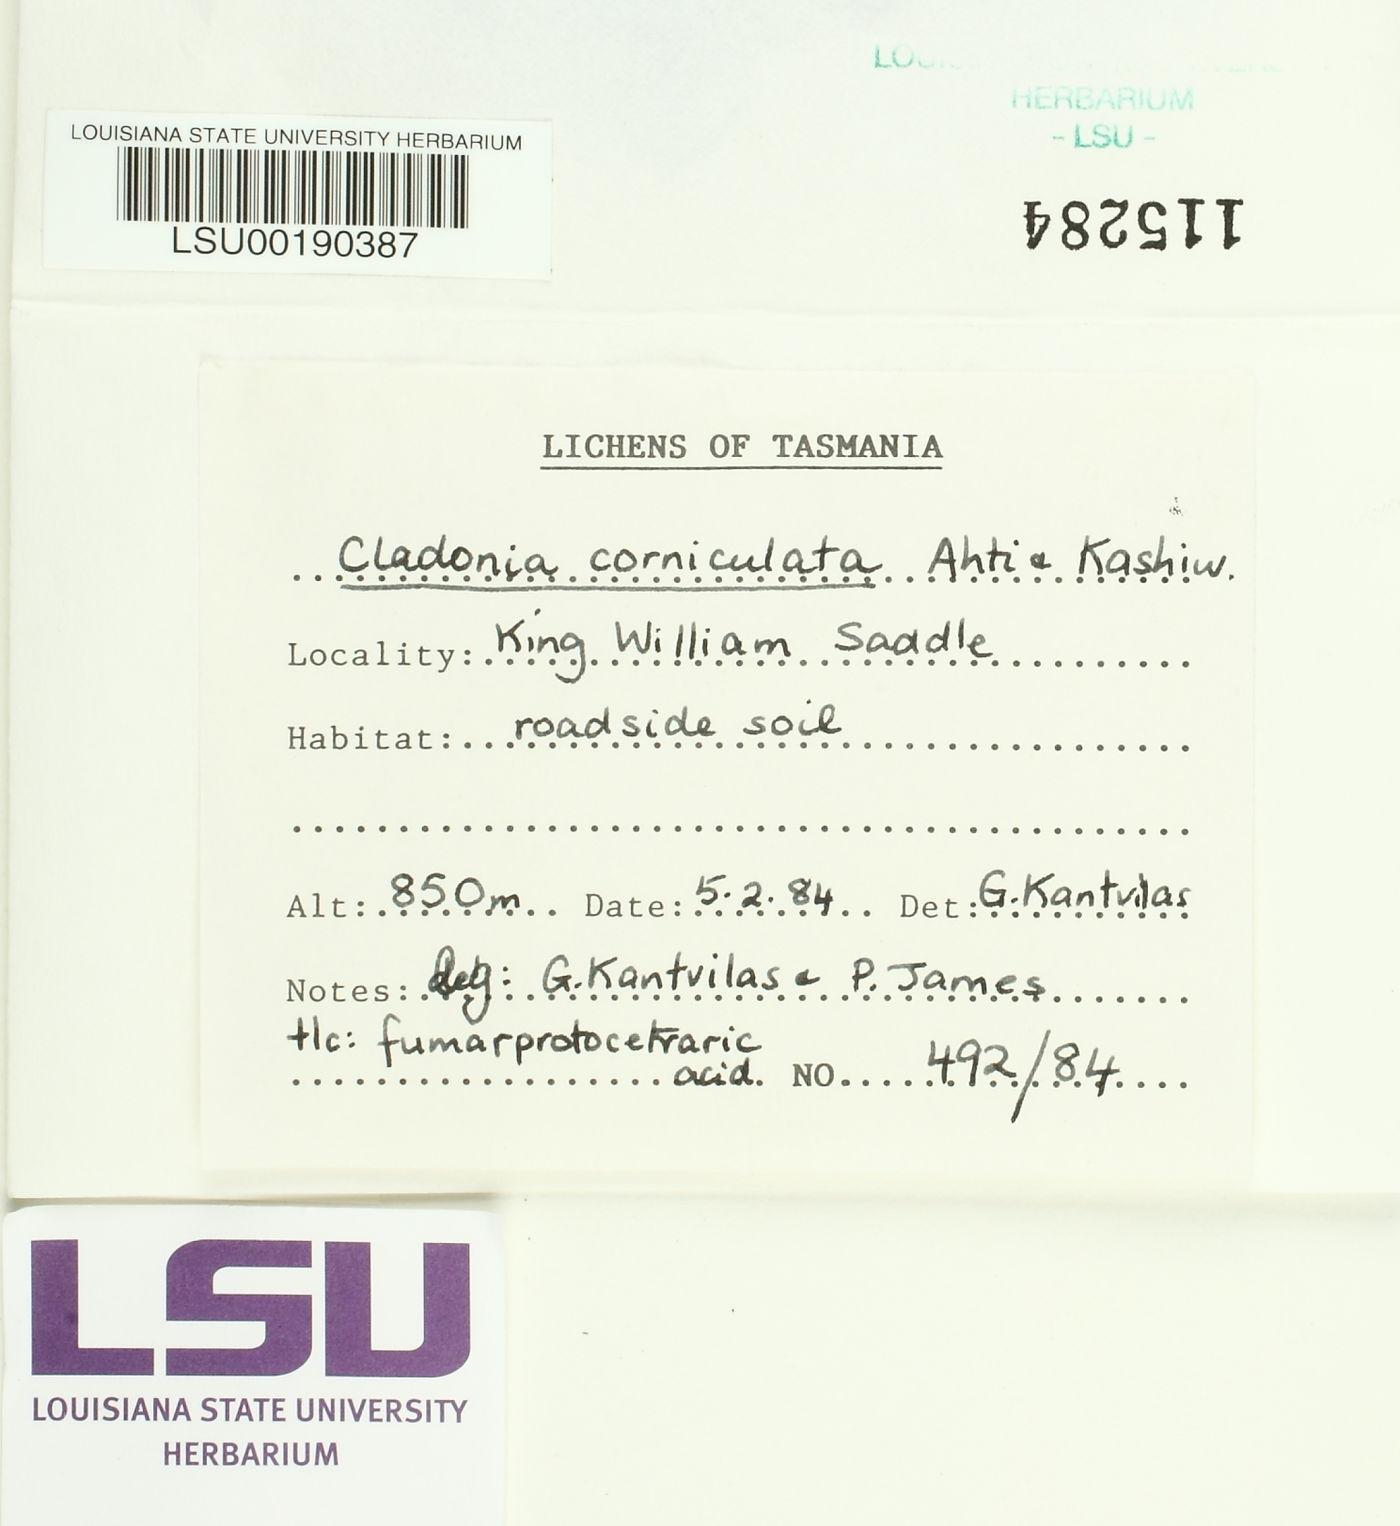 Cladonia corniculata image